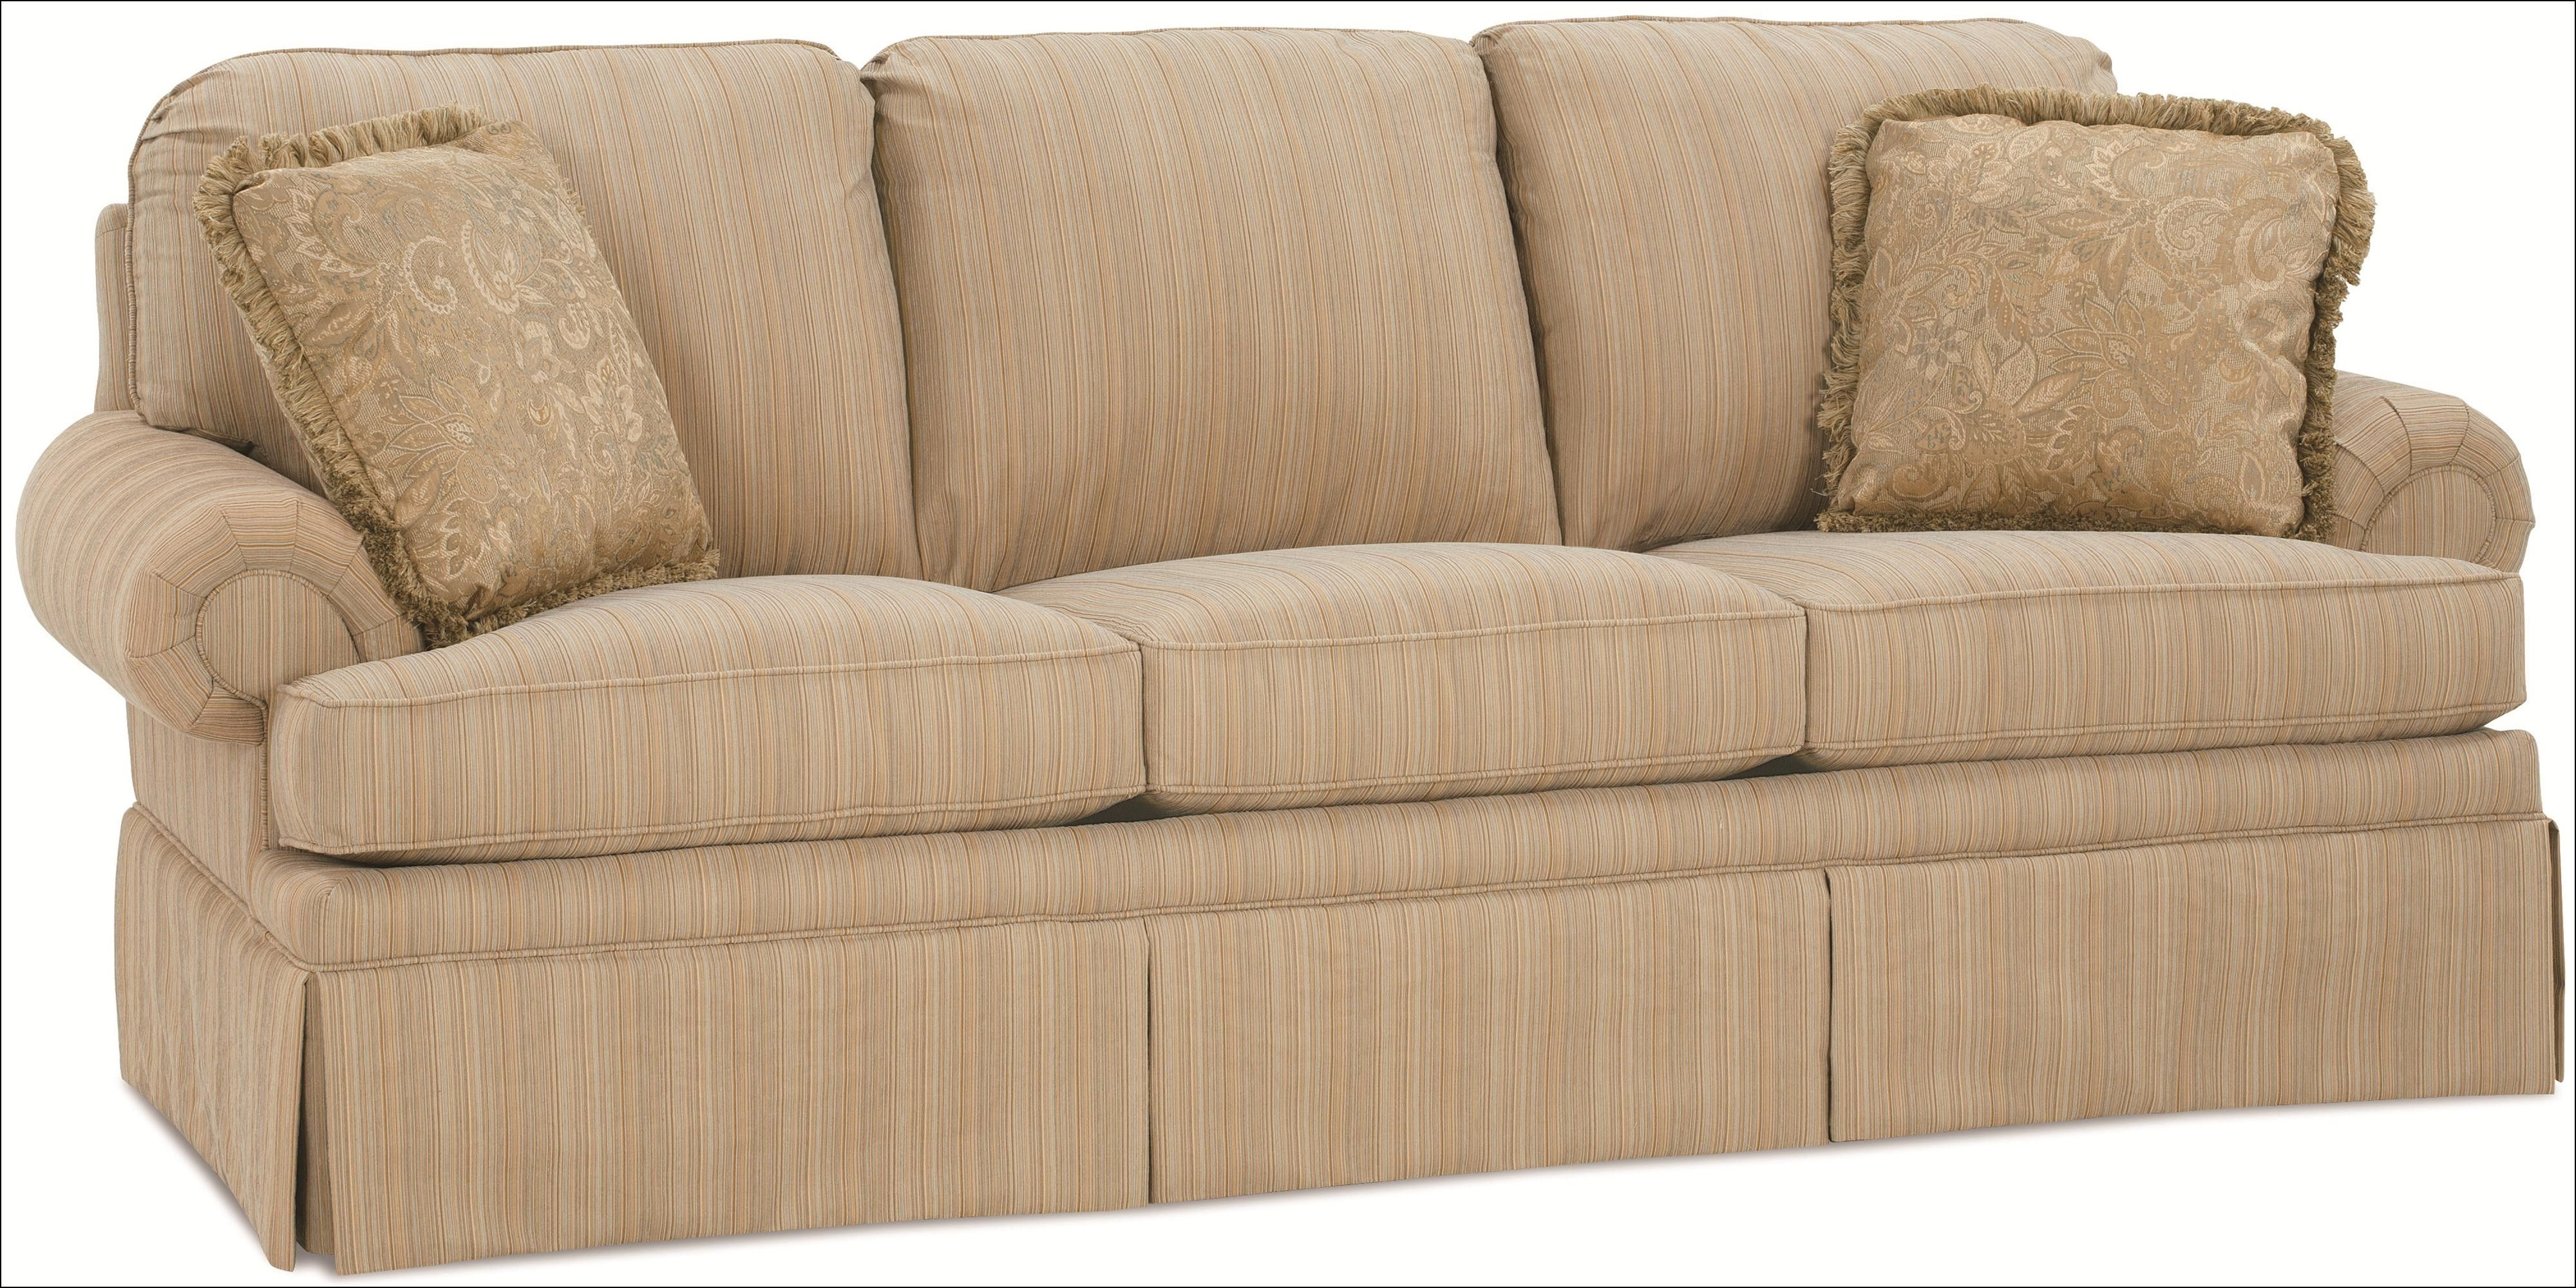 Clayton Marcus Sofa Prices Sofa Price Traditional Sofa Home Decor